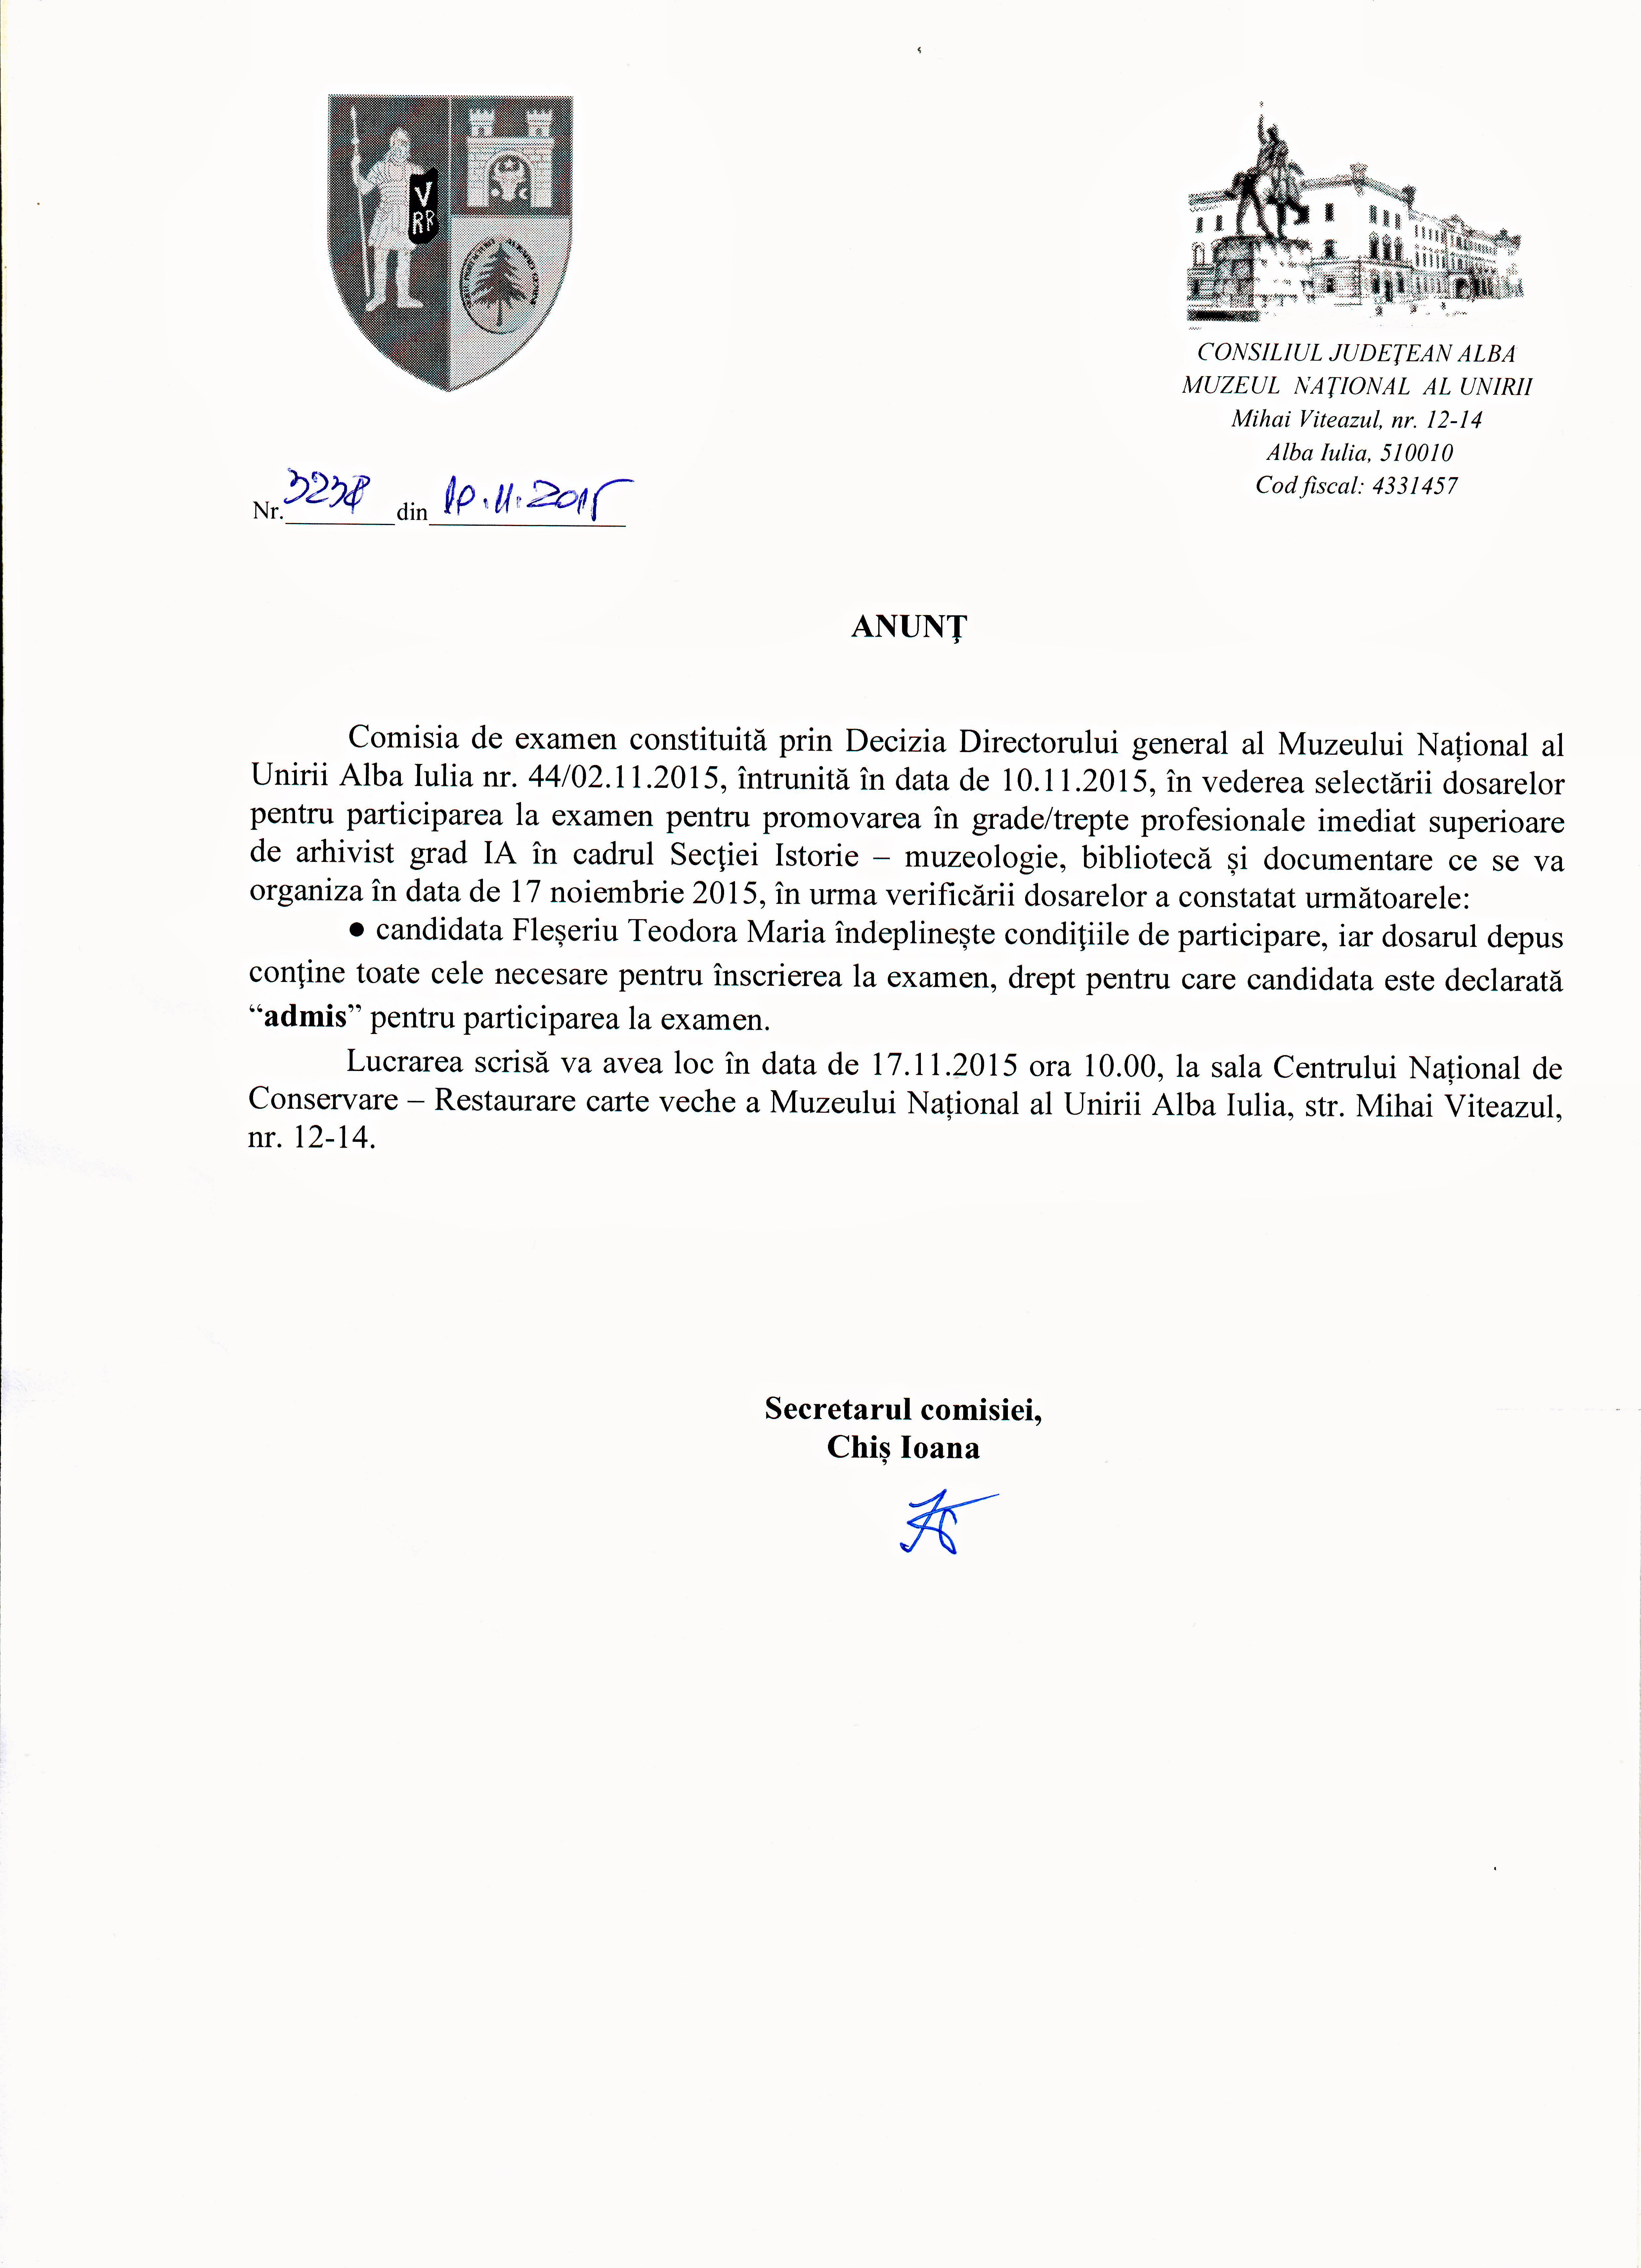 secretariat 10 nov 2015 anunt arhivist iA